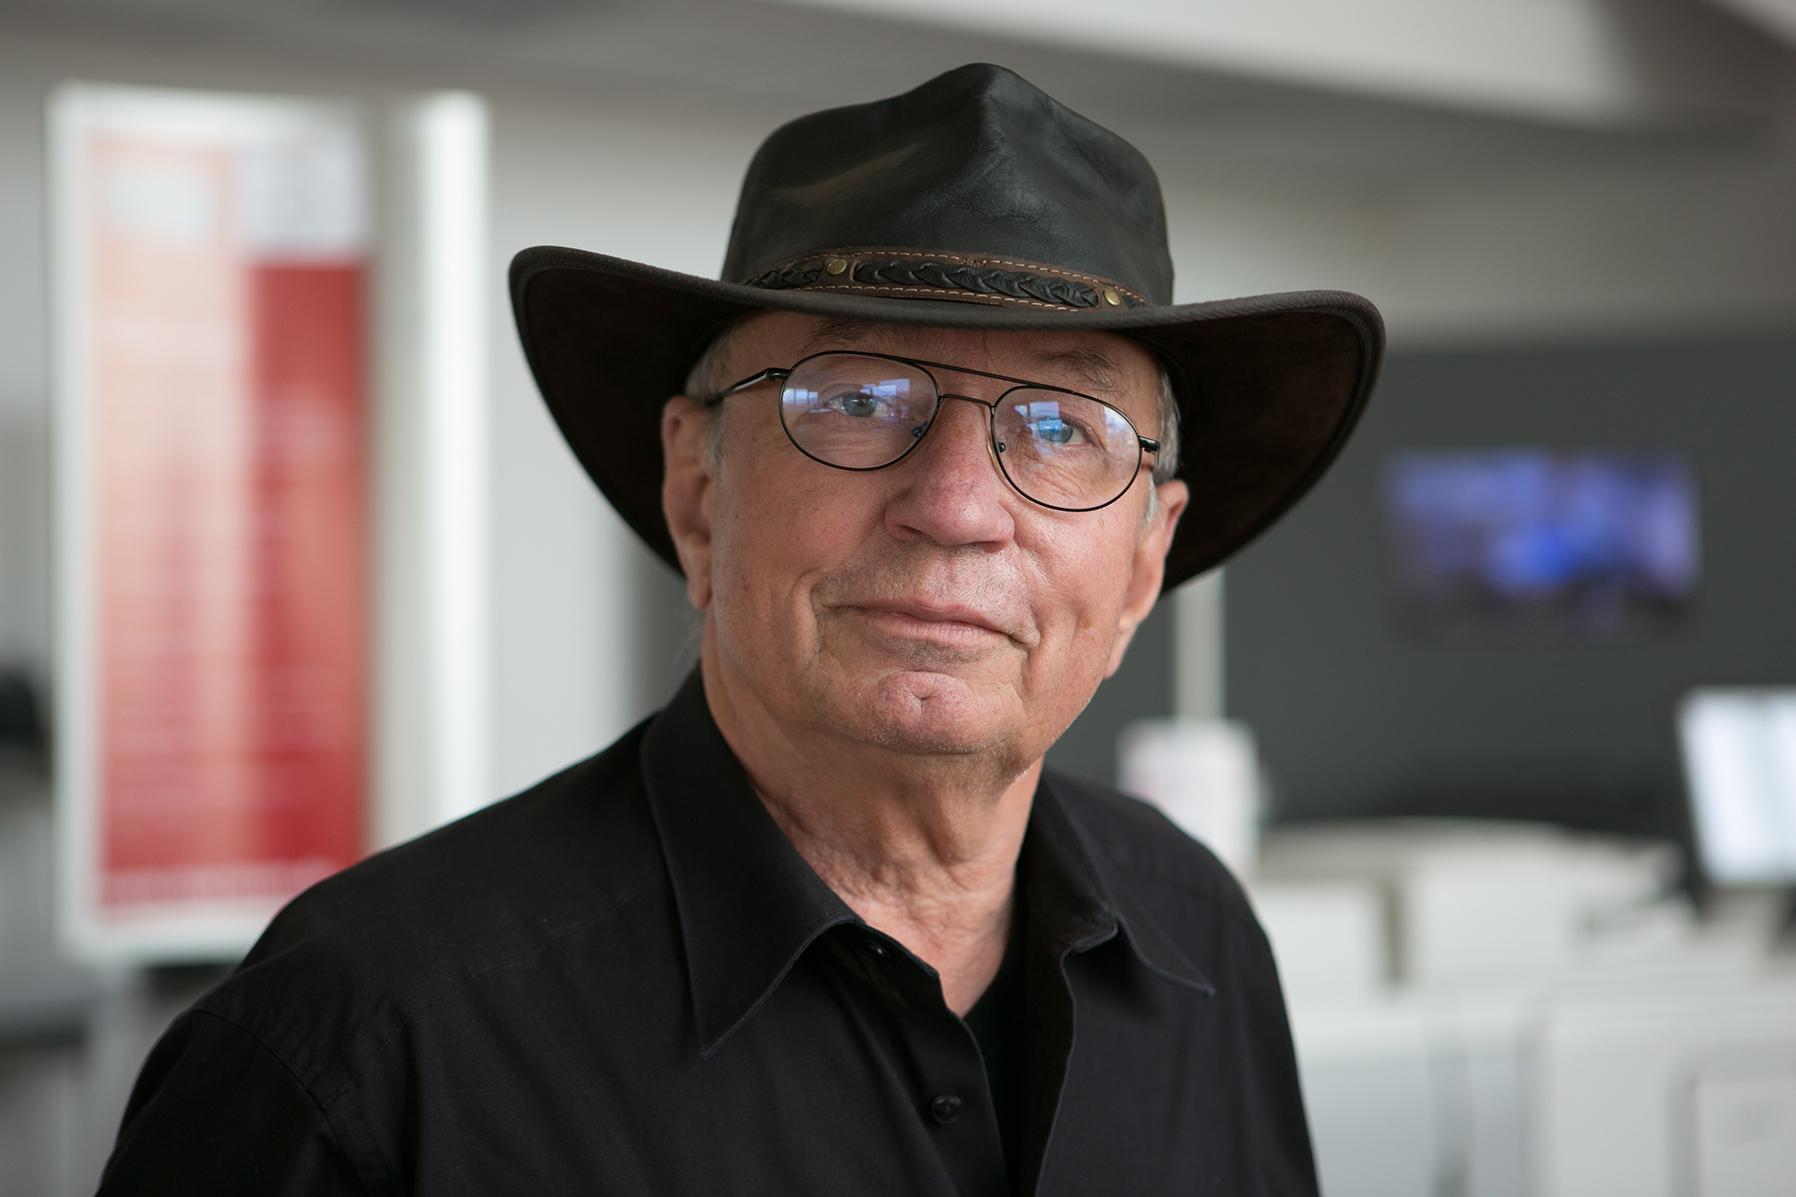 Petr Hubatka